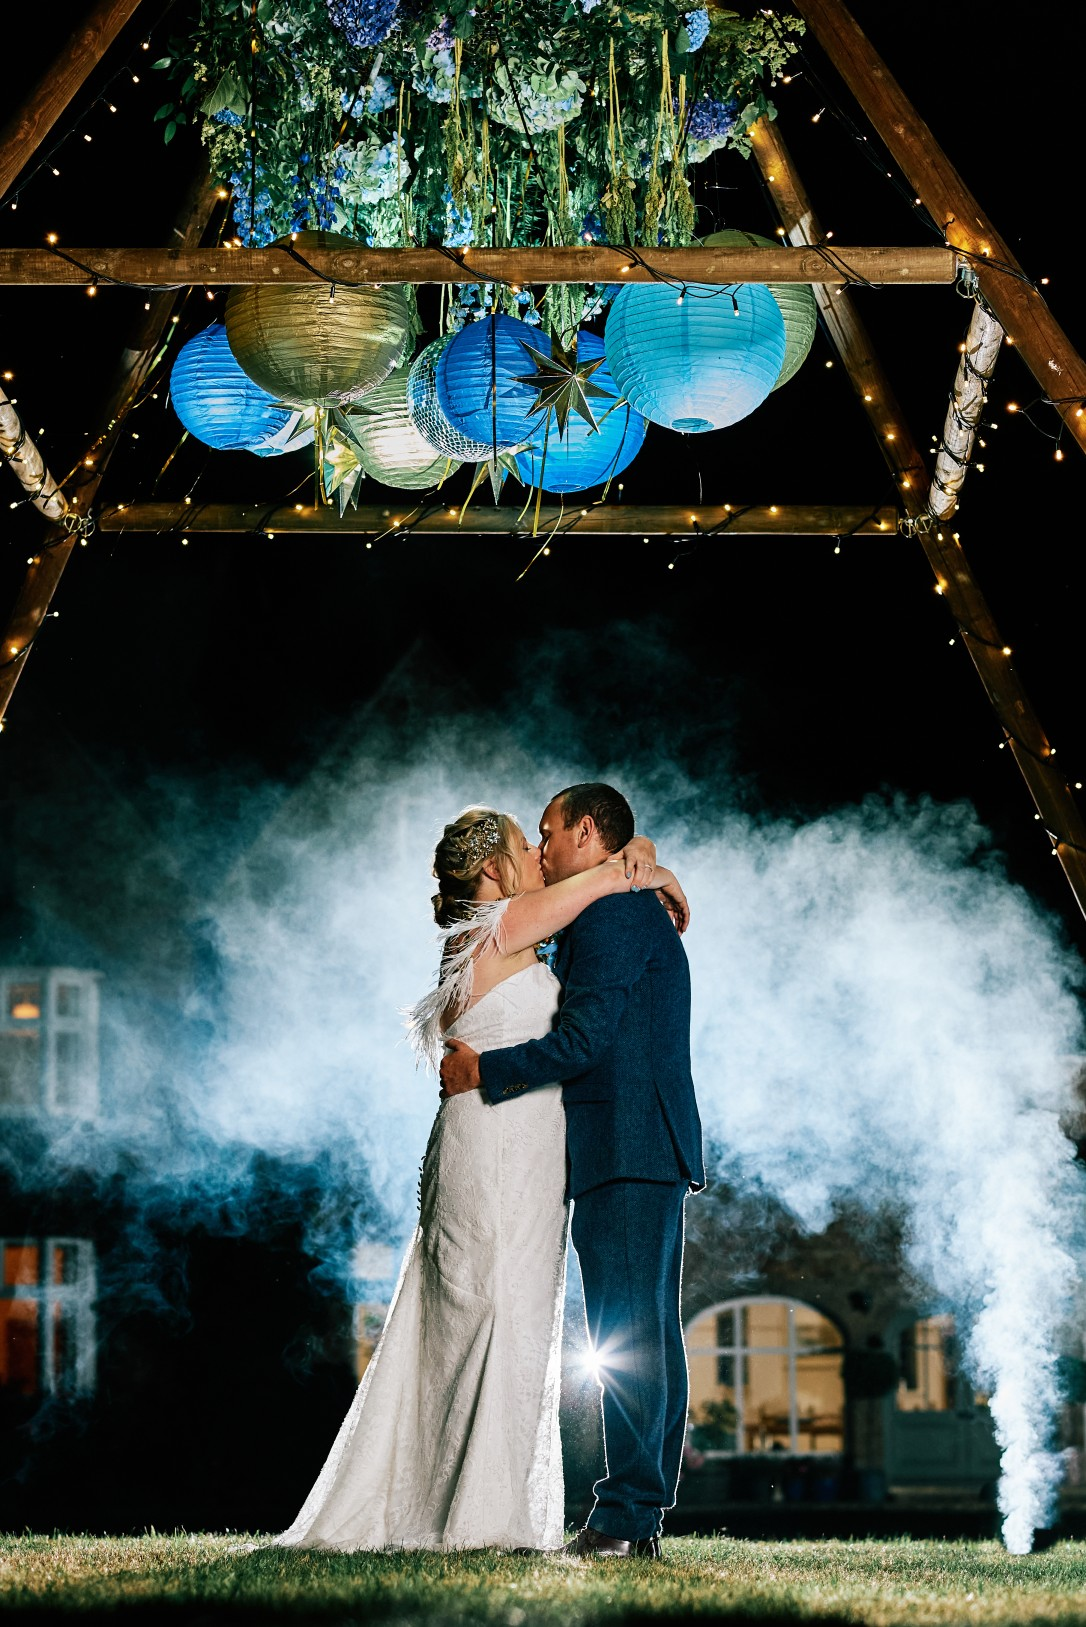 nhs wedding - paramedic wedding - blue and gold wedding - outdoor wedding - micro wedding - surprise wedding - wedding smoke bomb photo